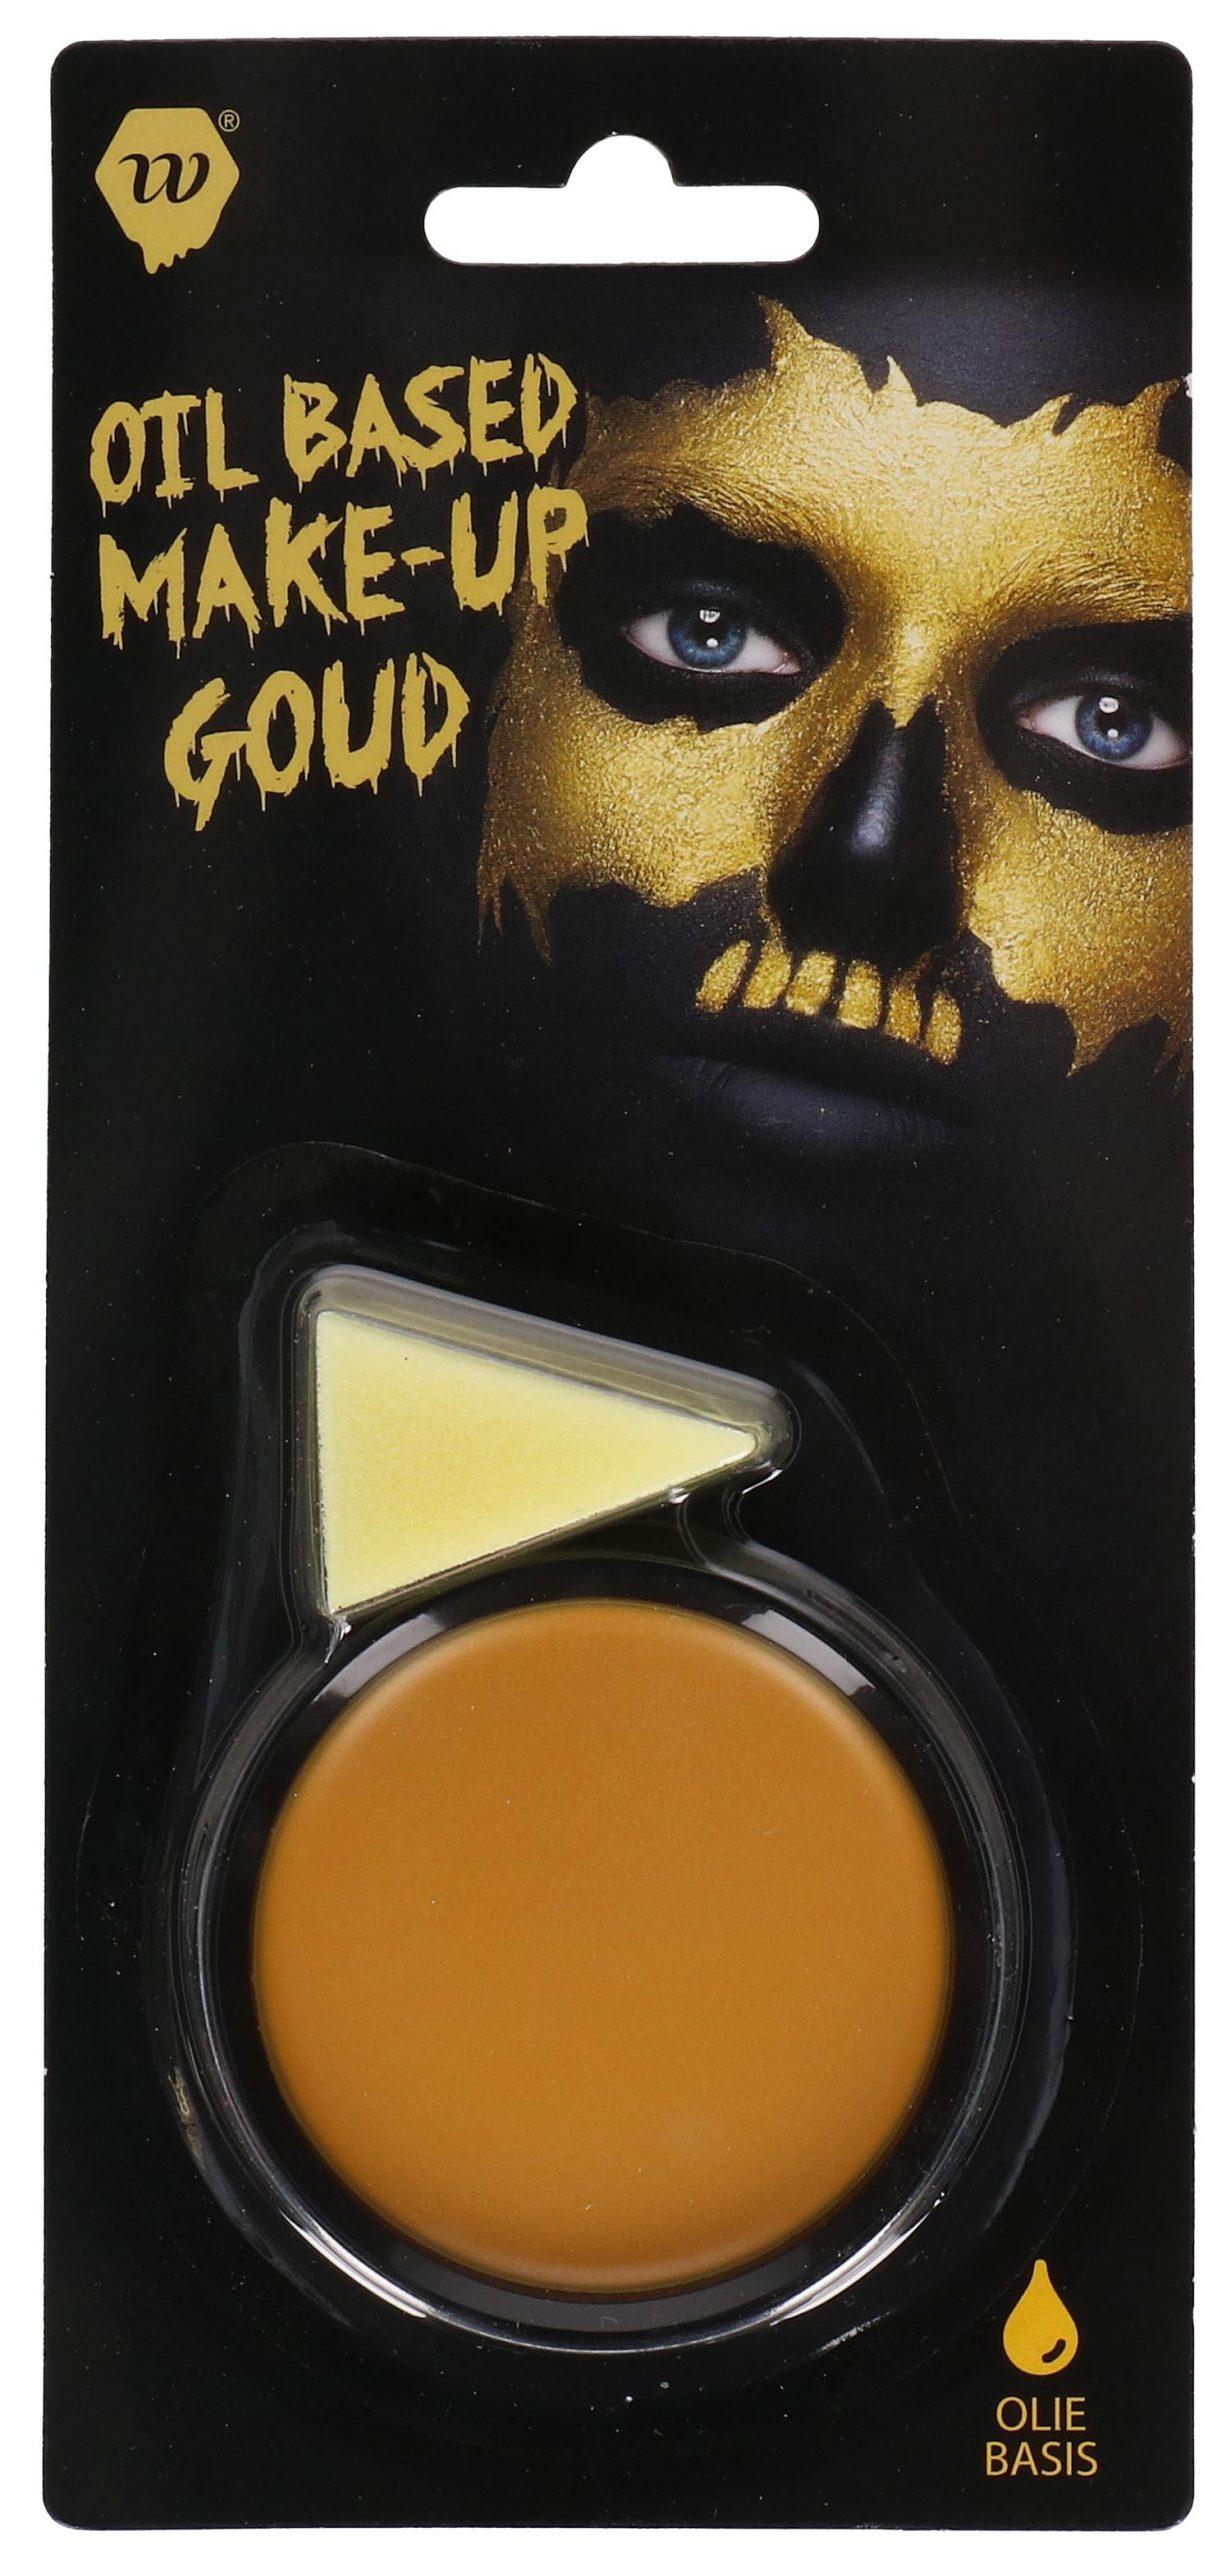 Oil-Based Make-up Goud Wauwfactor